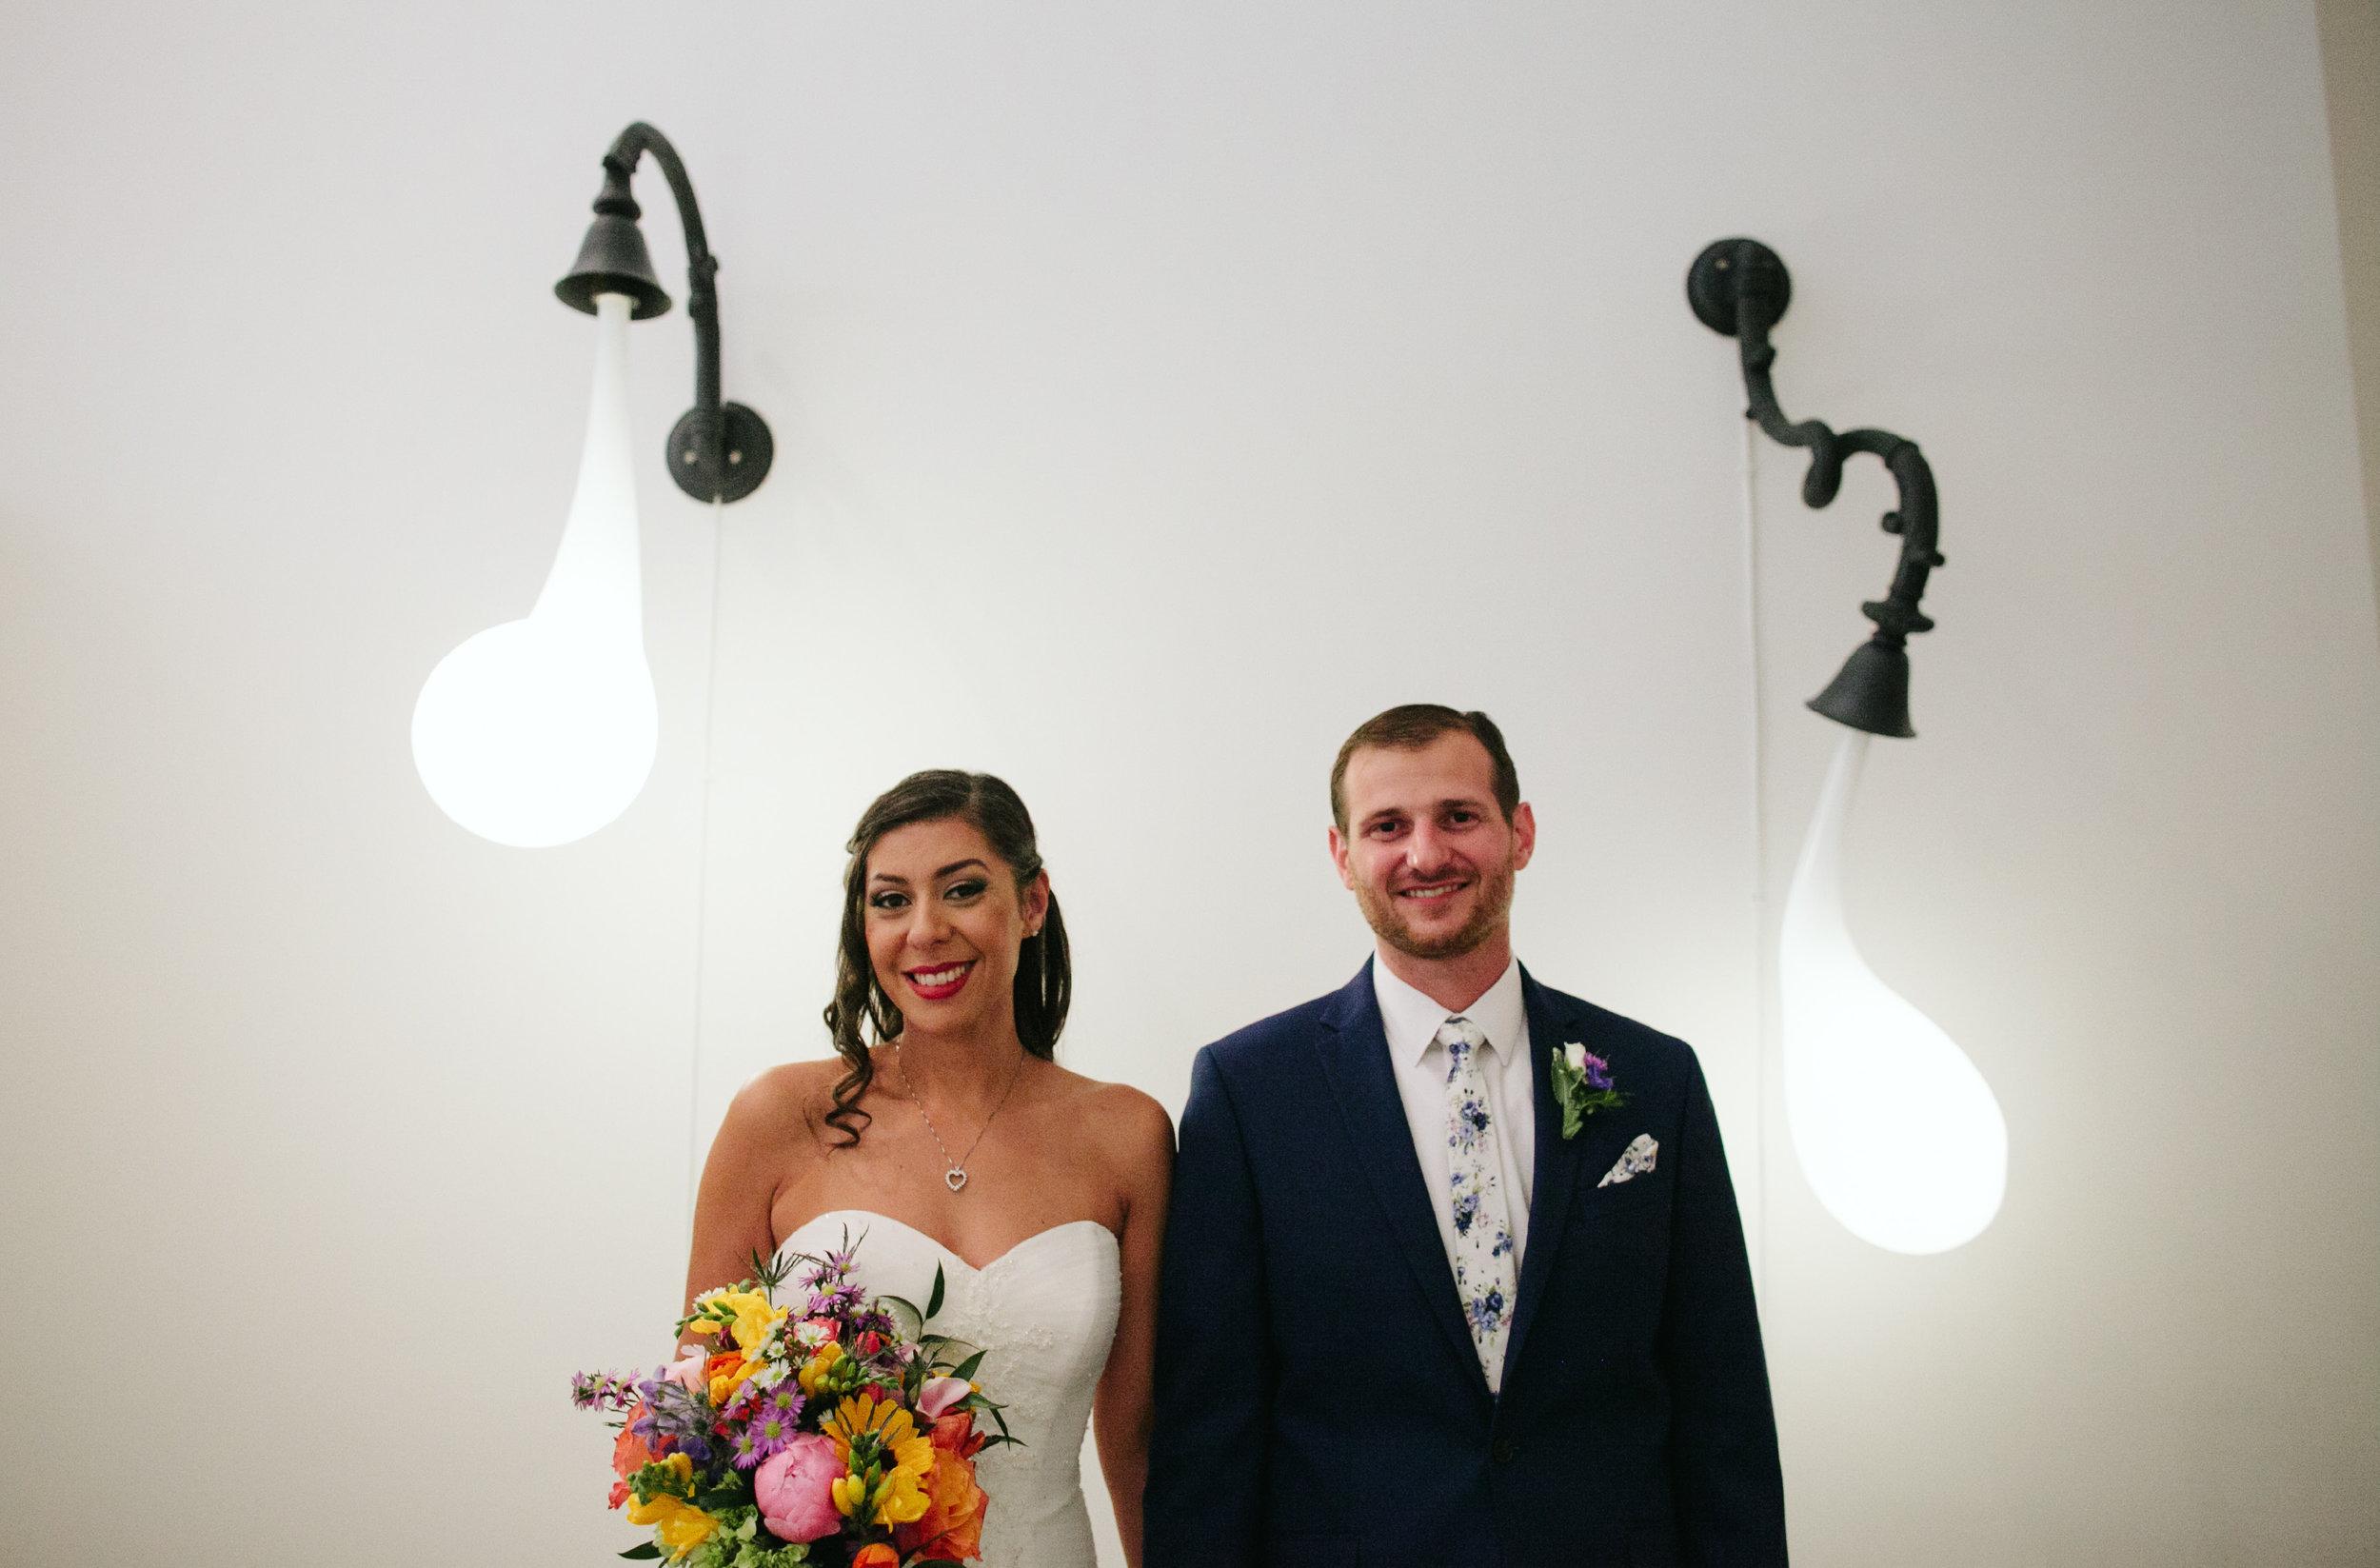 Museum Wedding at the Boca Raton Museum12.jpg